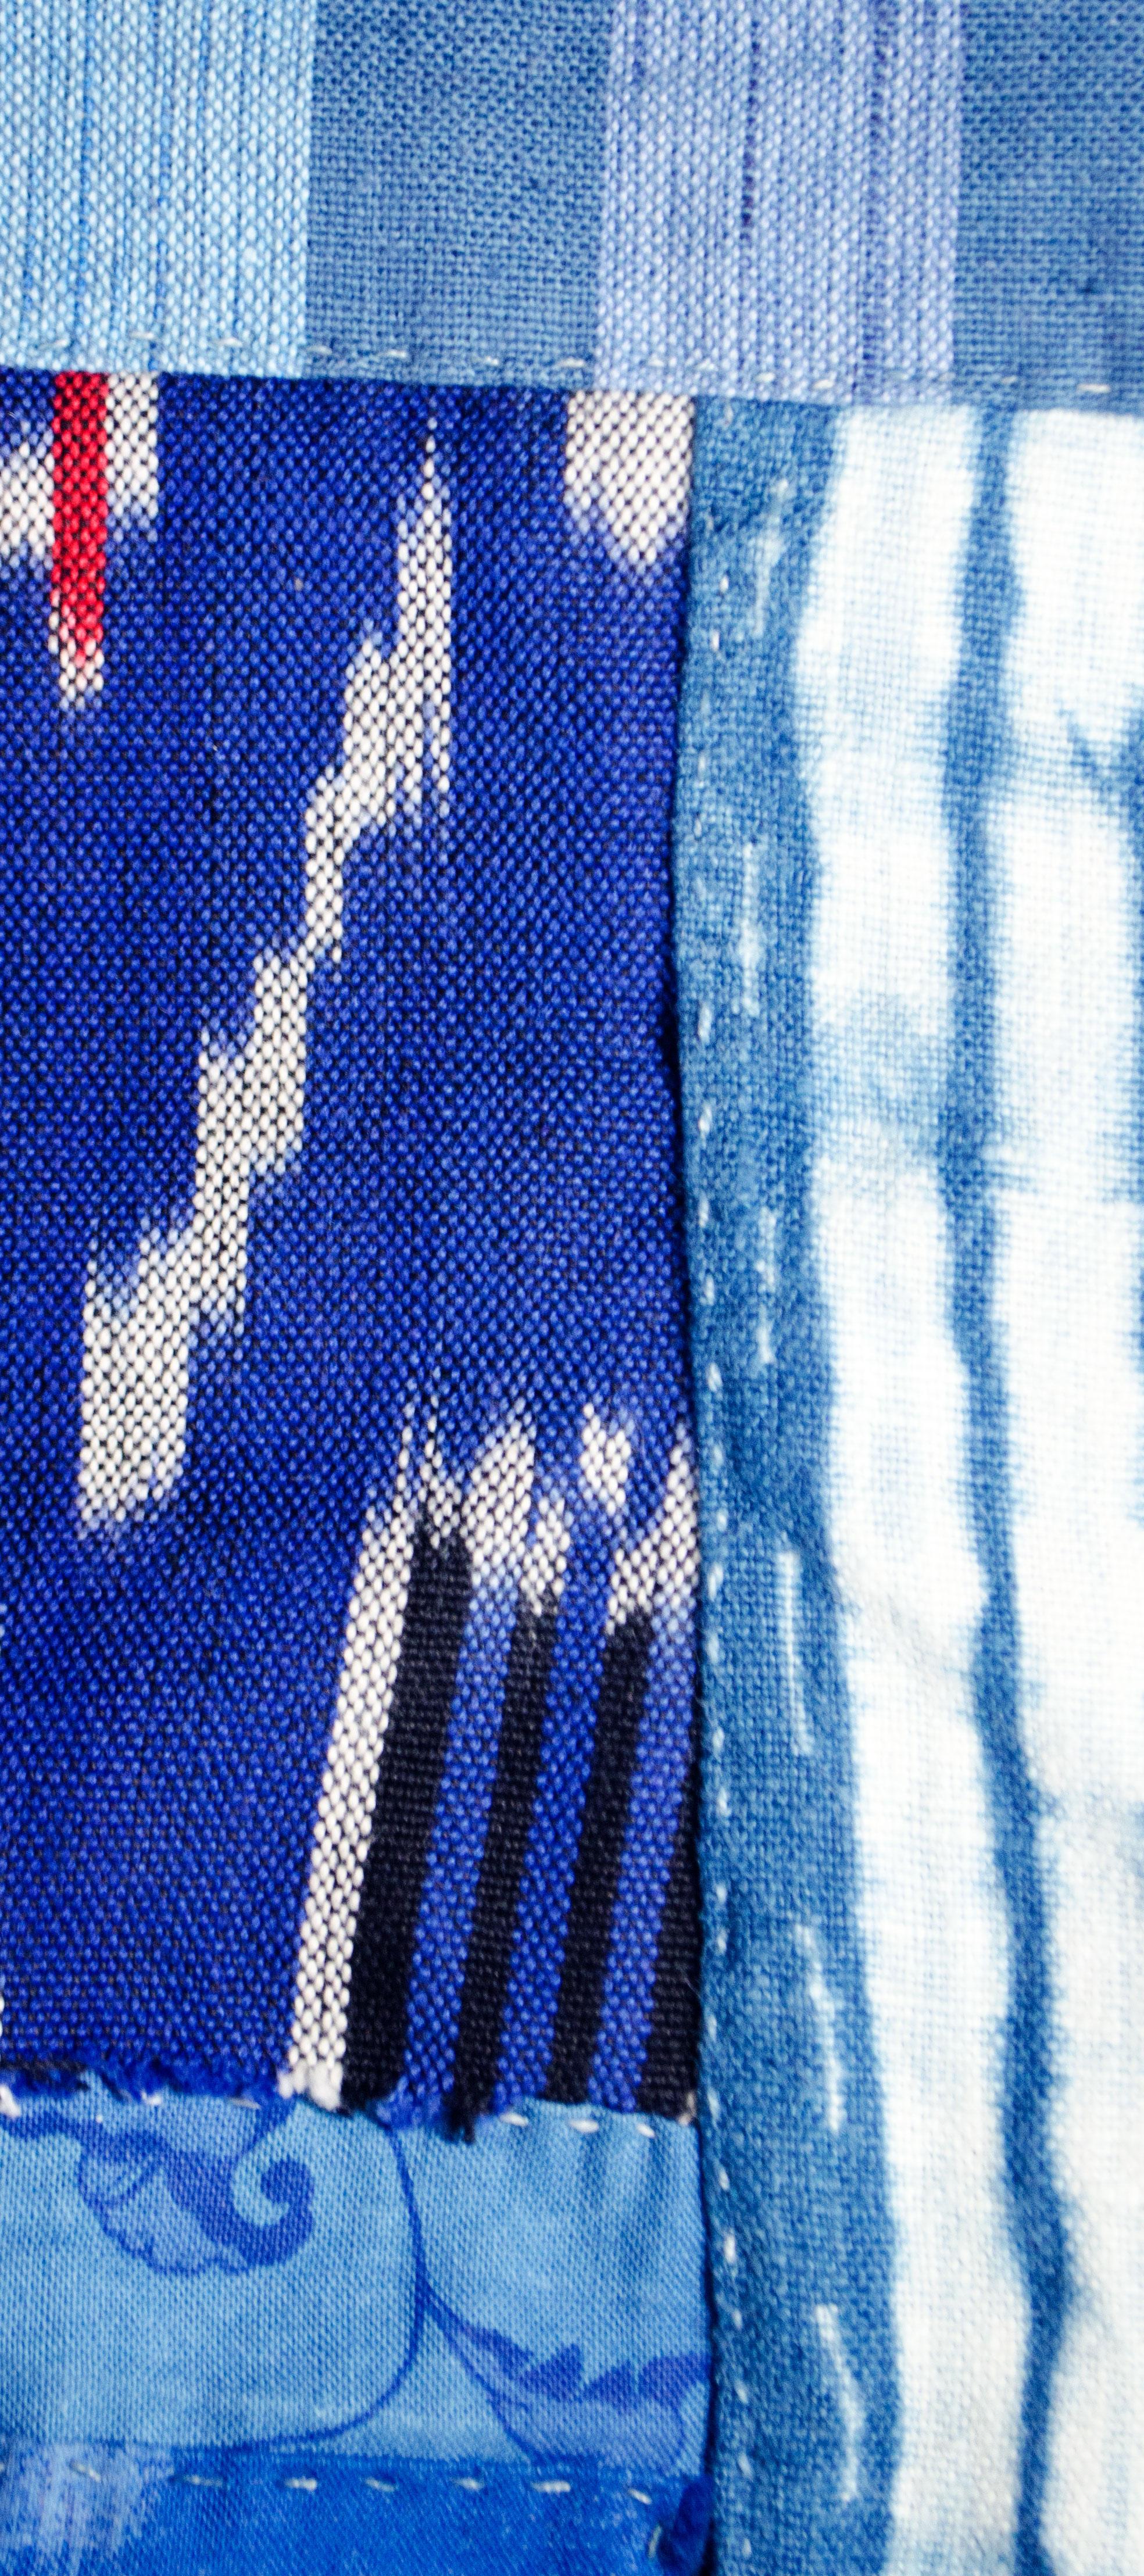 Handstitched shibori dyed indigo linen with ikat woven cotton